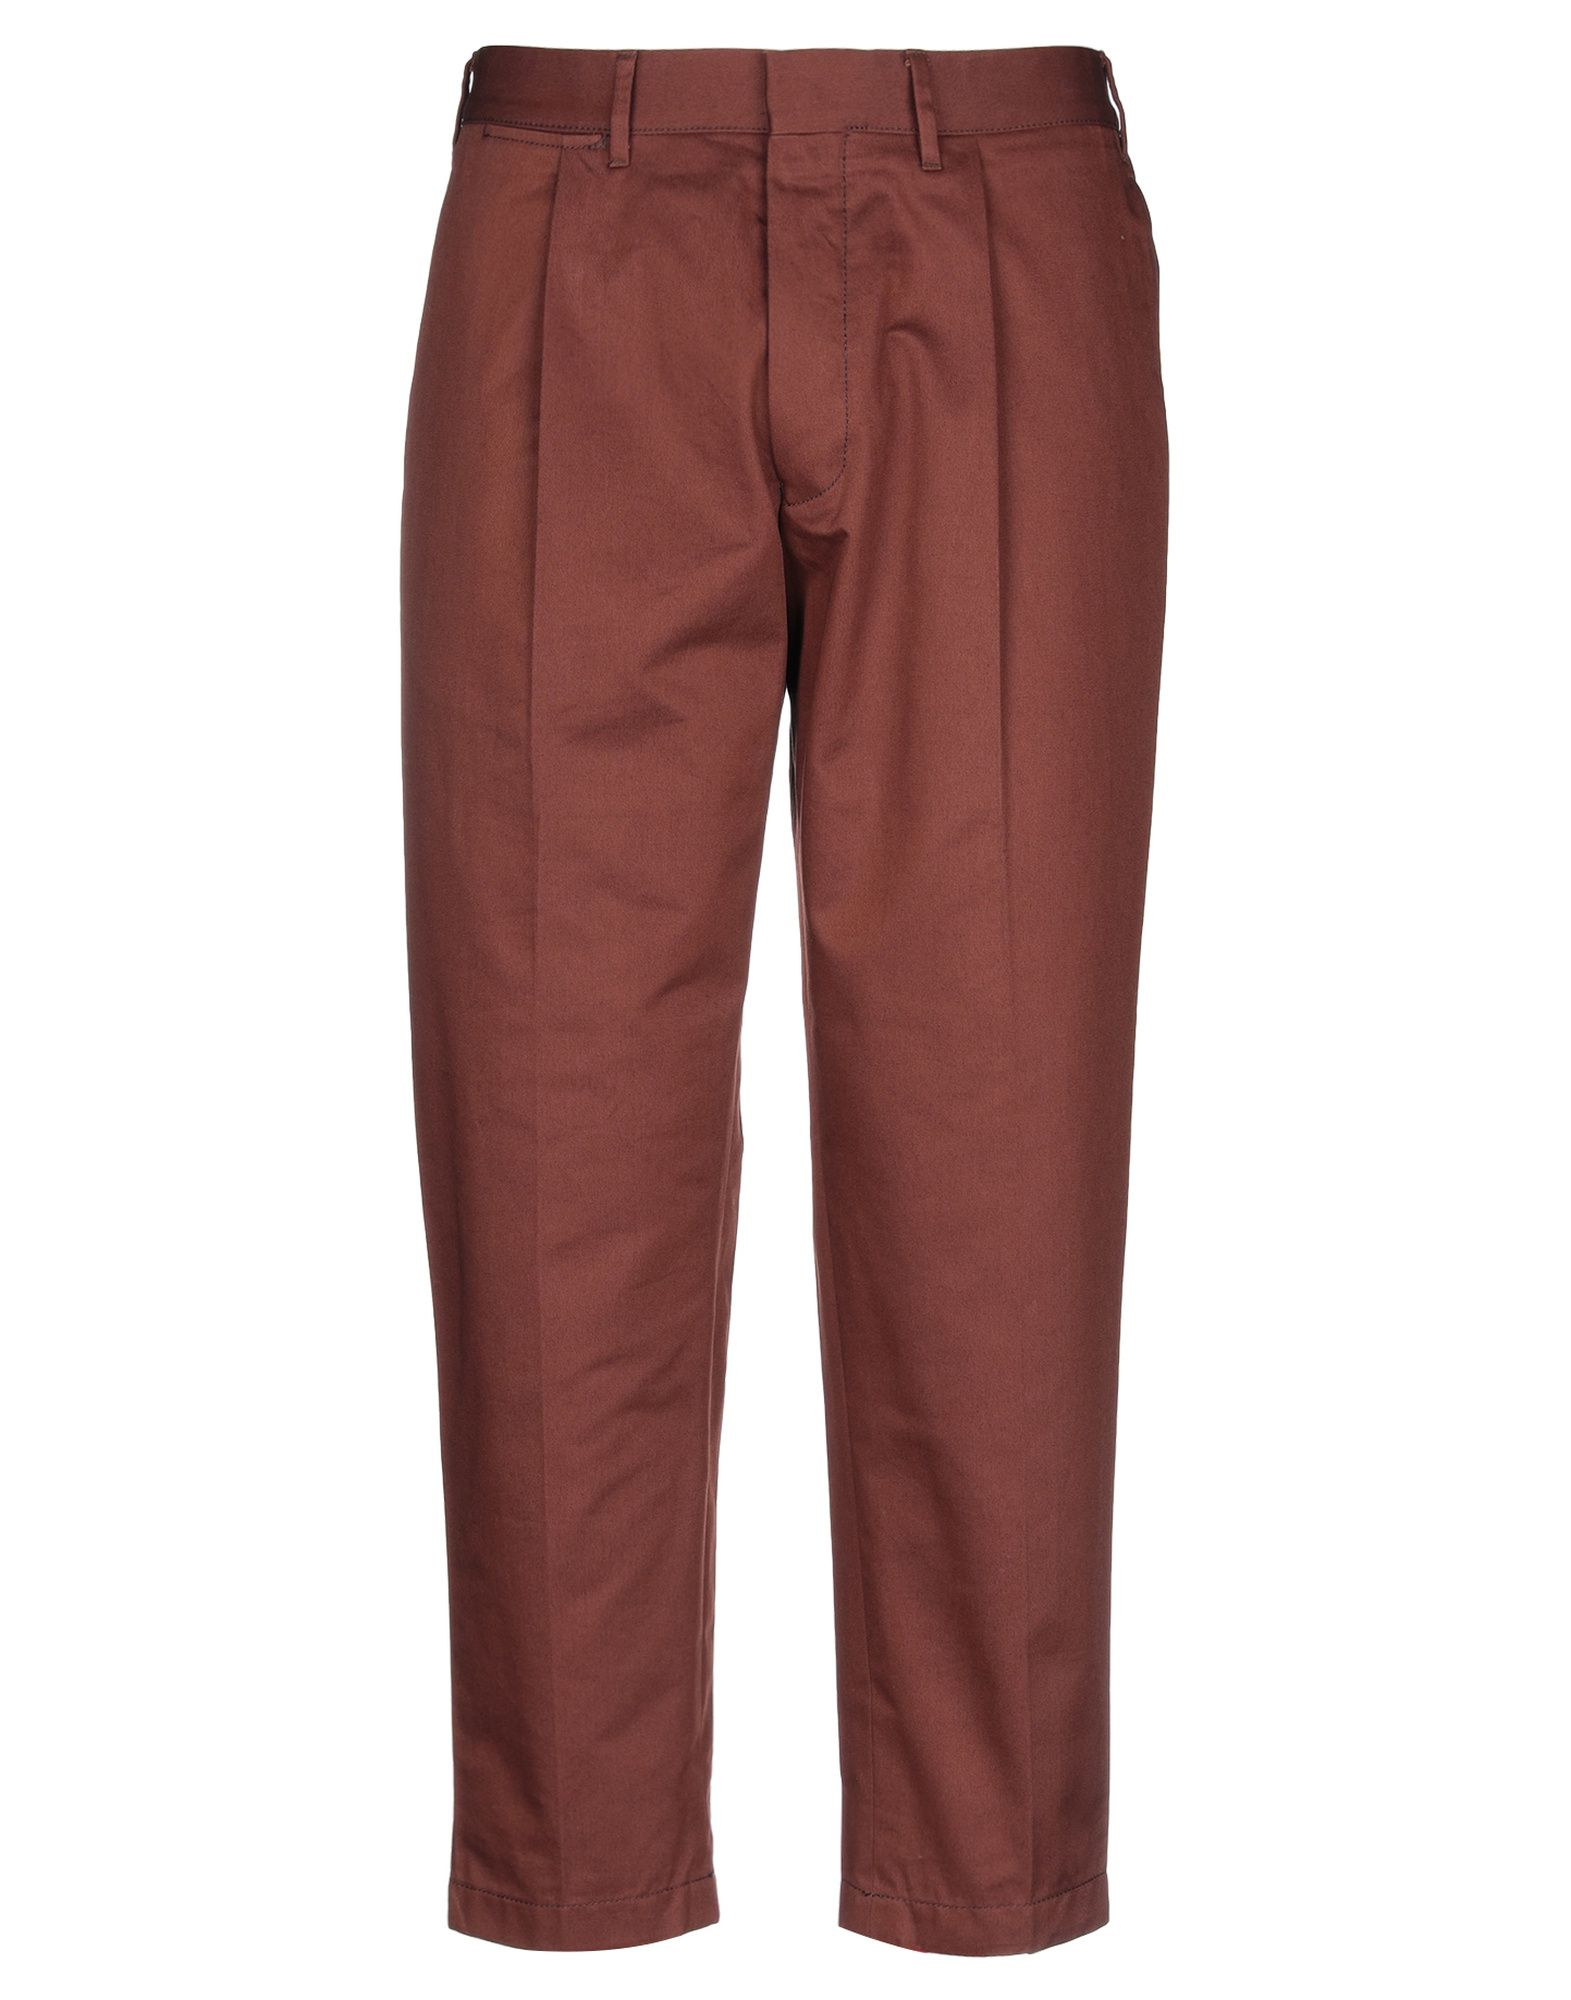 THE GIGI Повседневные брюки брюки чинос quelle quelle 920895